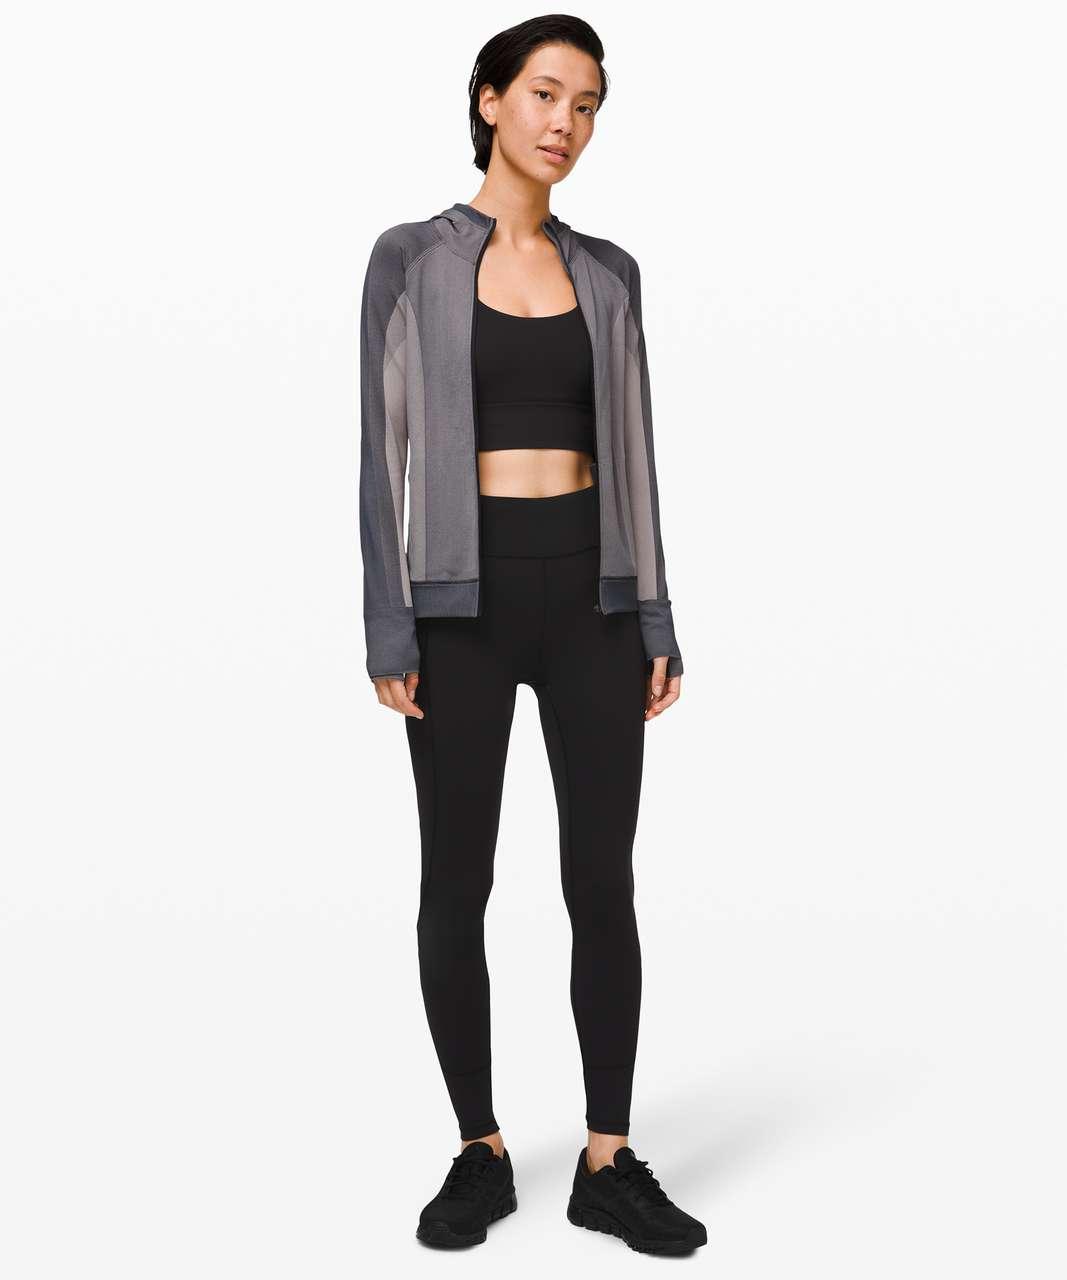 Lululemon Ebb to Train Jacket *Abstract - Black / Dark Chrome